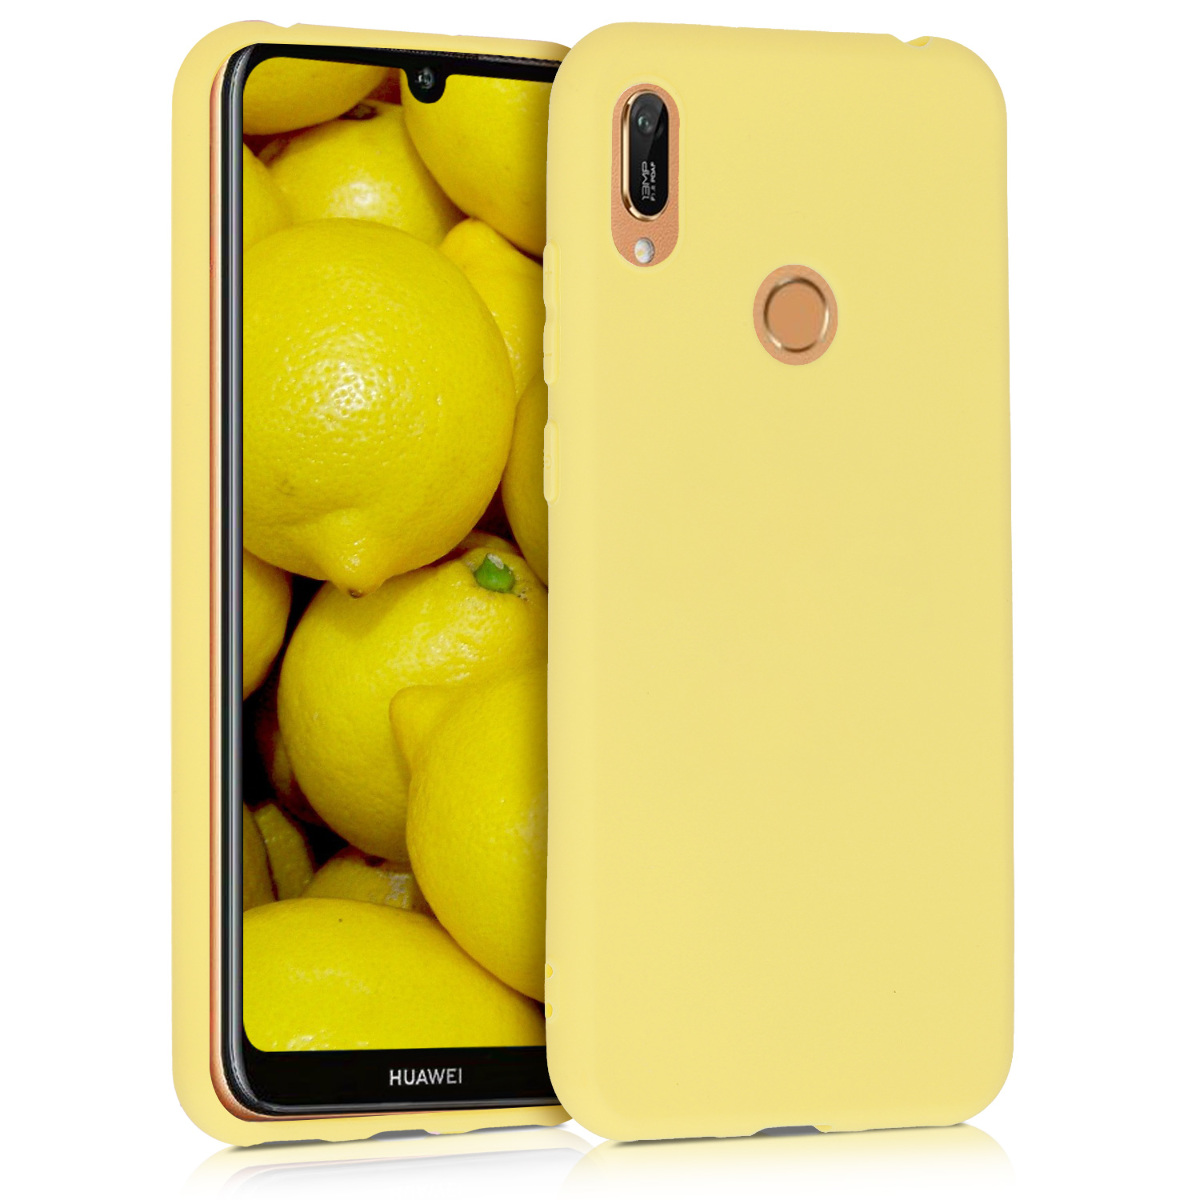 KW Θήκη Σιλικόνης  Huawei Y6 2019 - Yellow Matte (48122.49 )